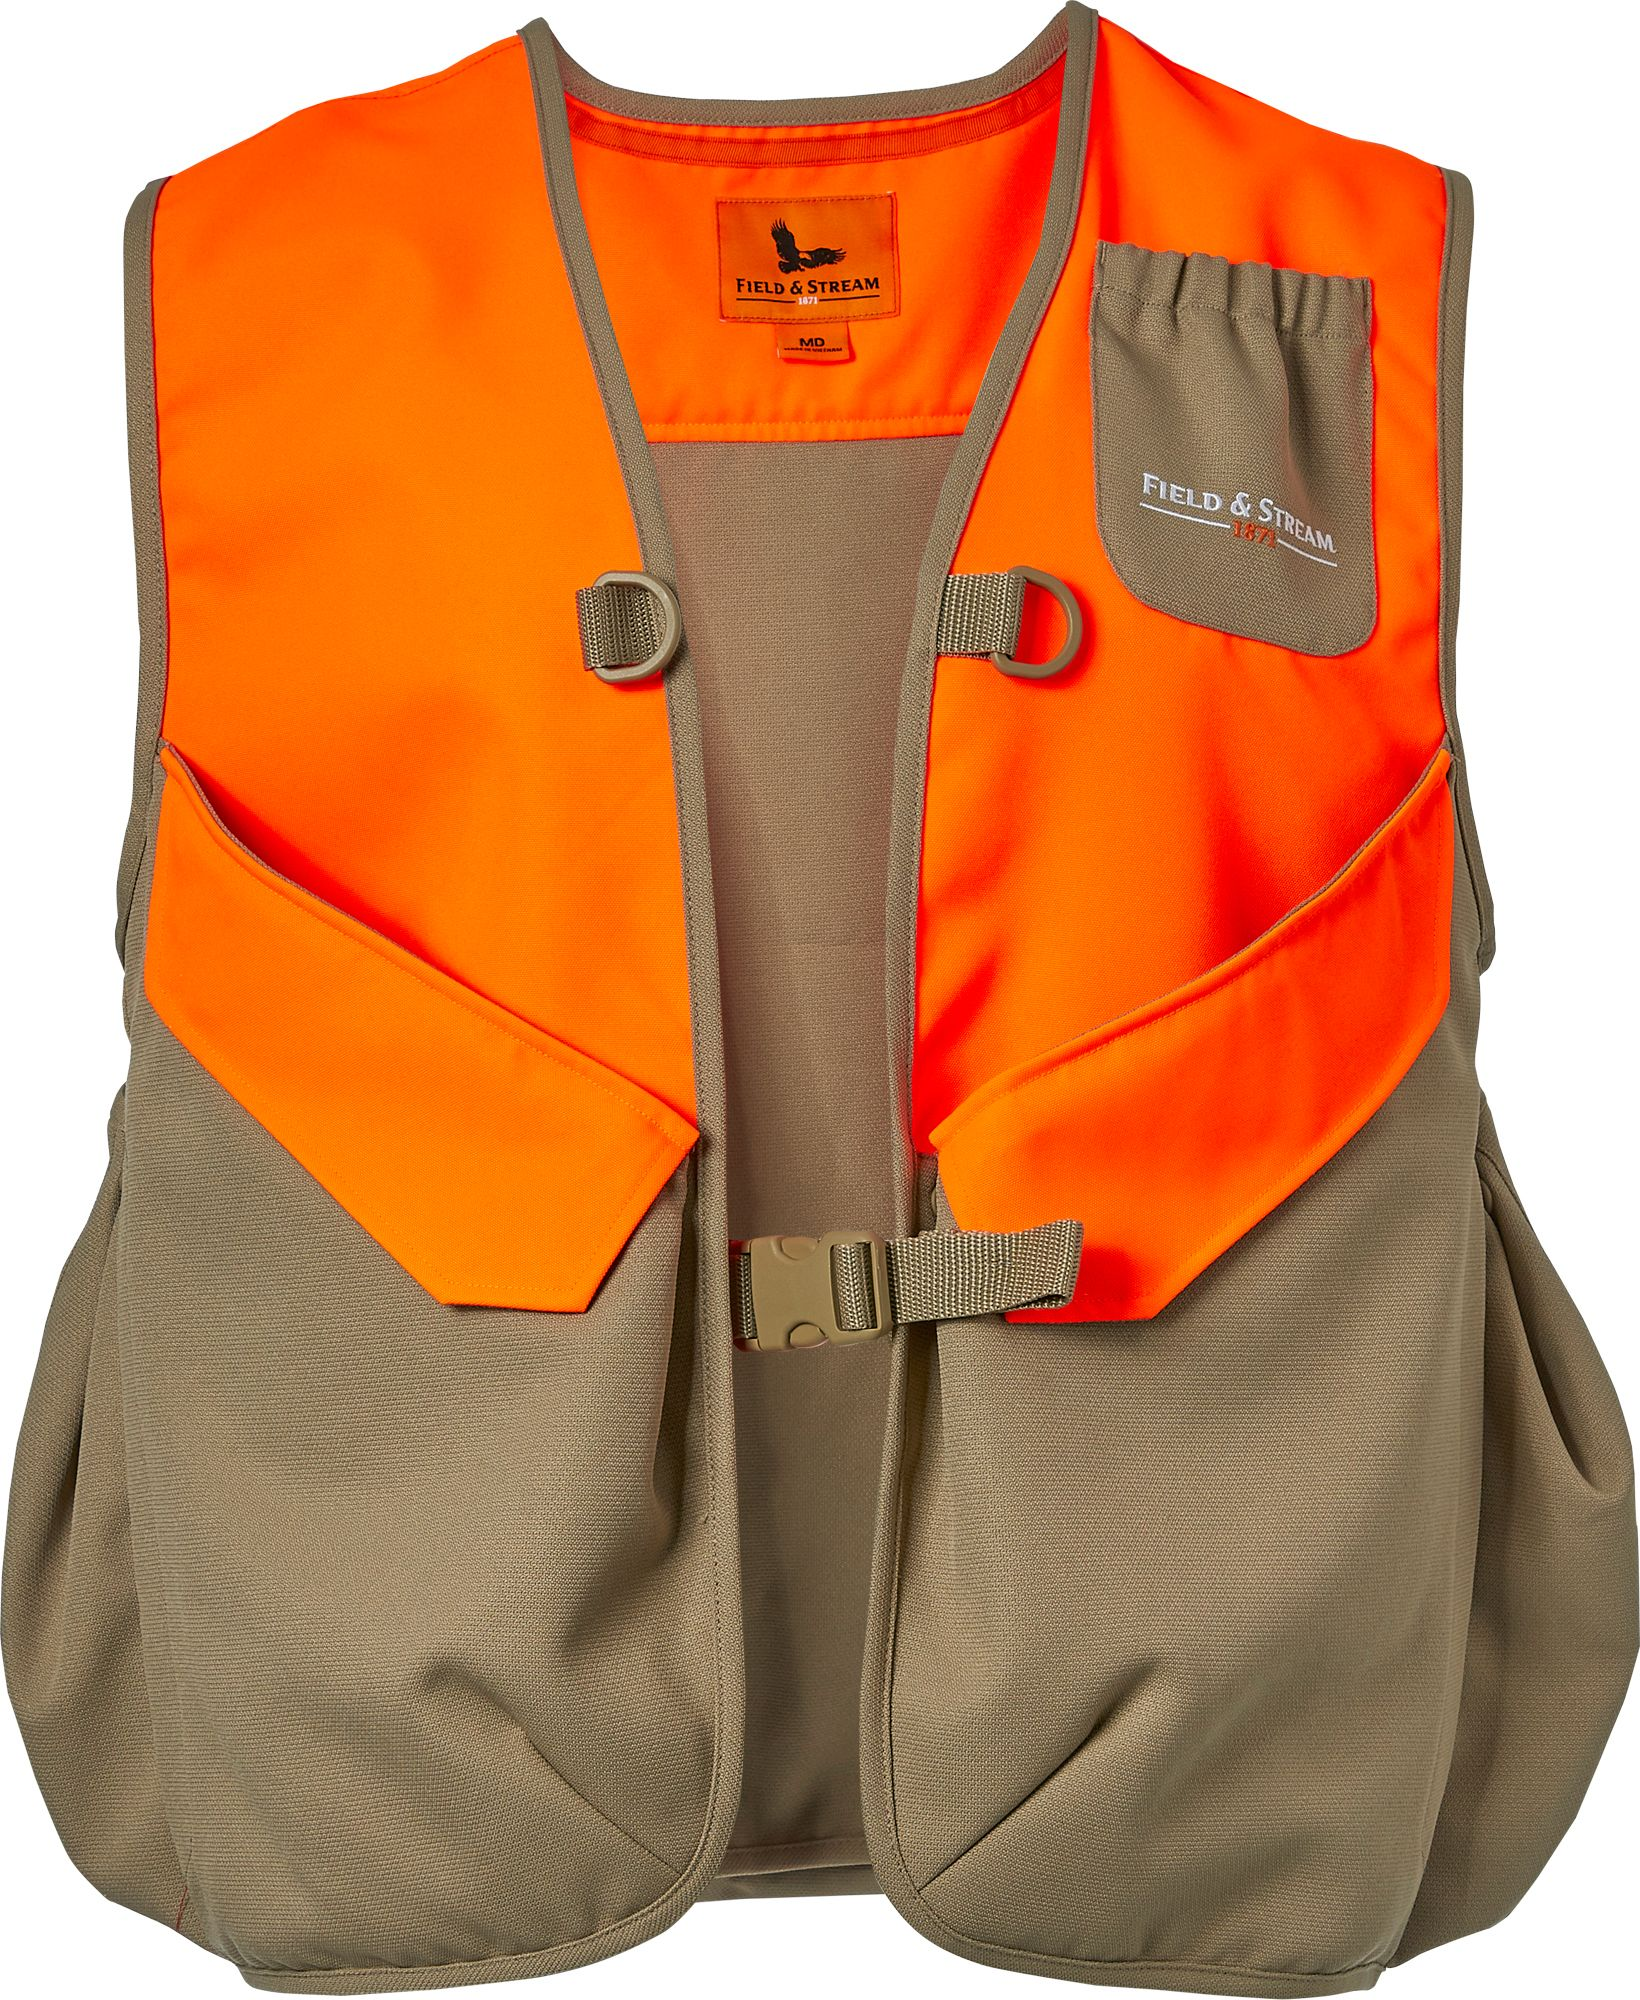 Field & Stream Men's Every Hunt Upland Vest, Size: Medium/Large, Canvas Blaze thumbnail